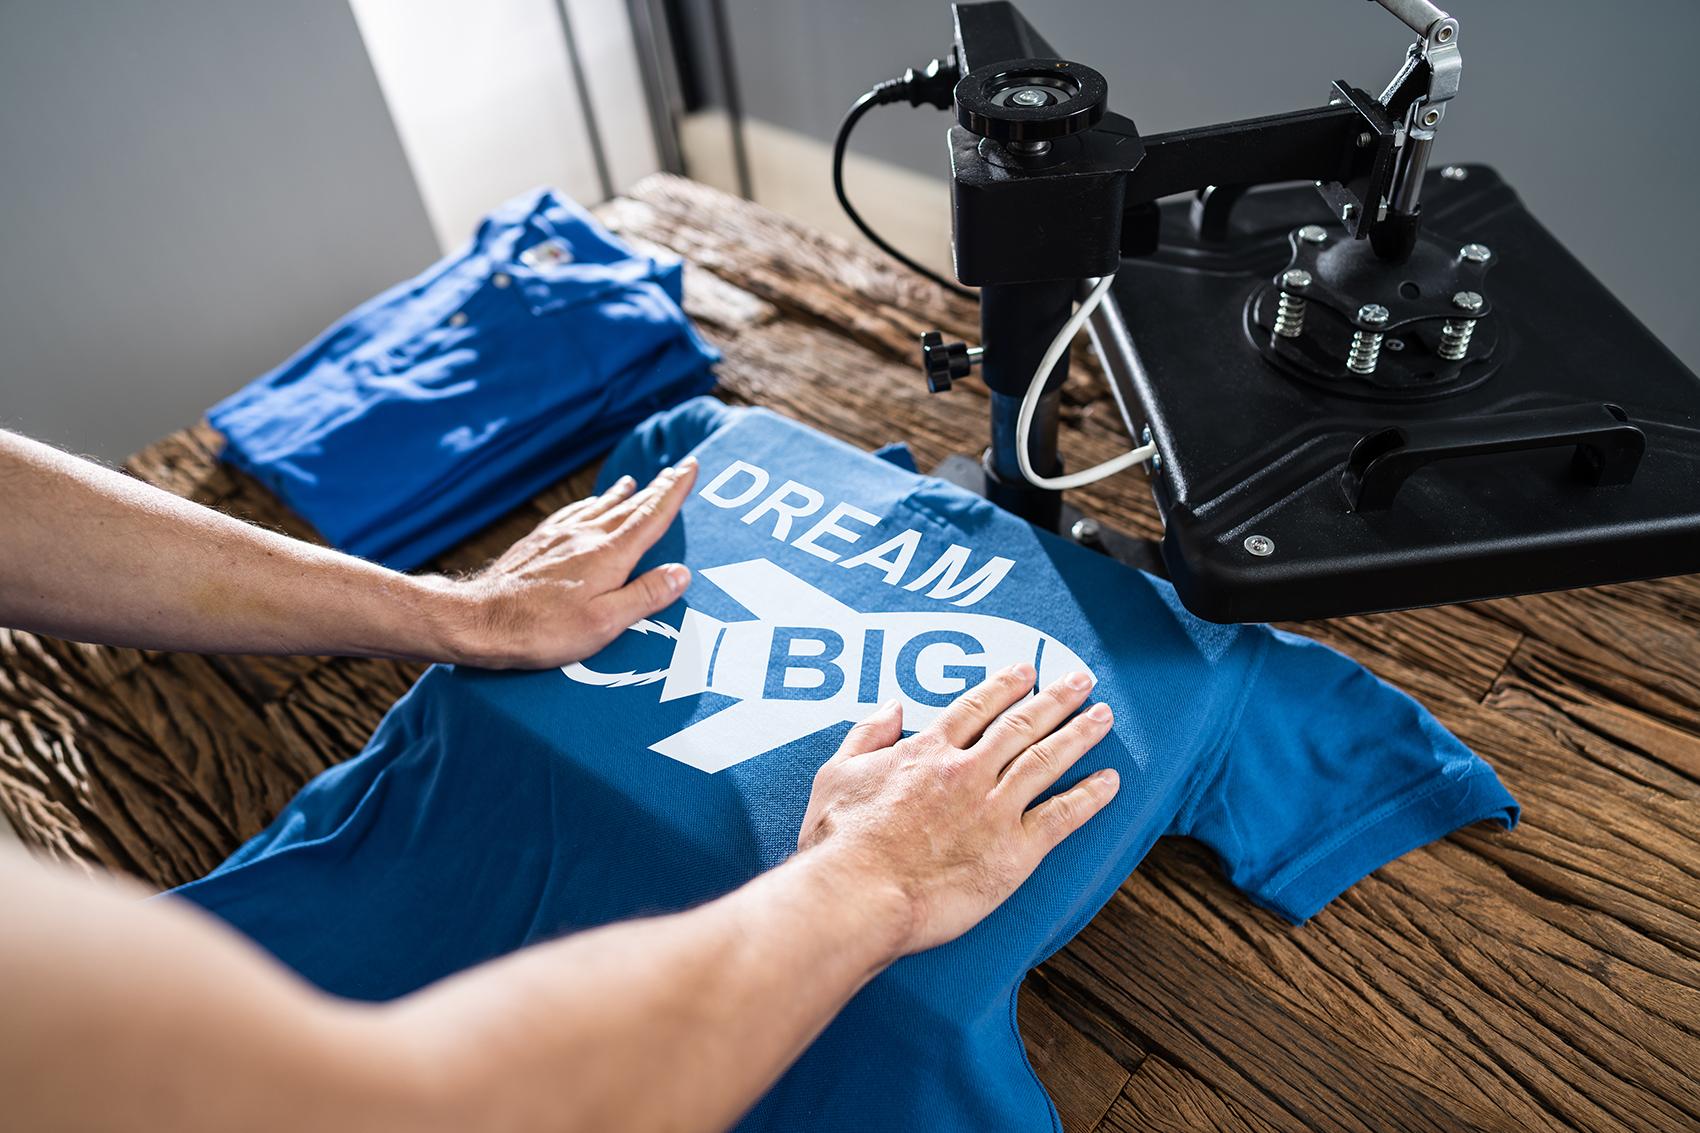 Custom Printed T-shirt, Progimpex Pluche knuffel laten maken